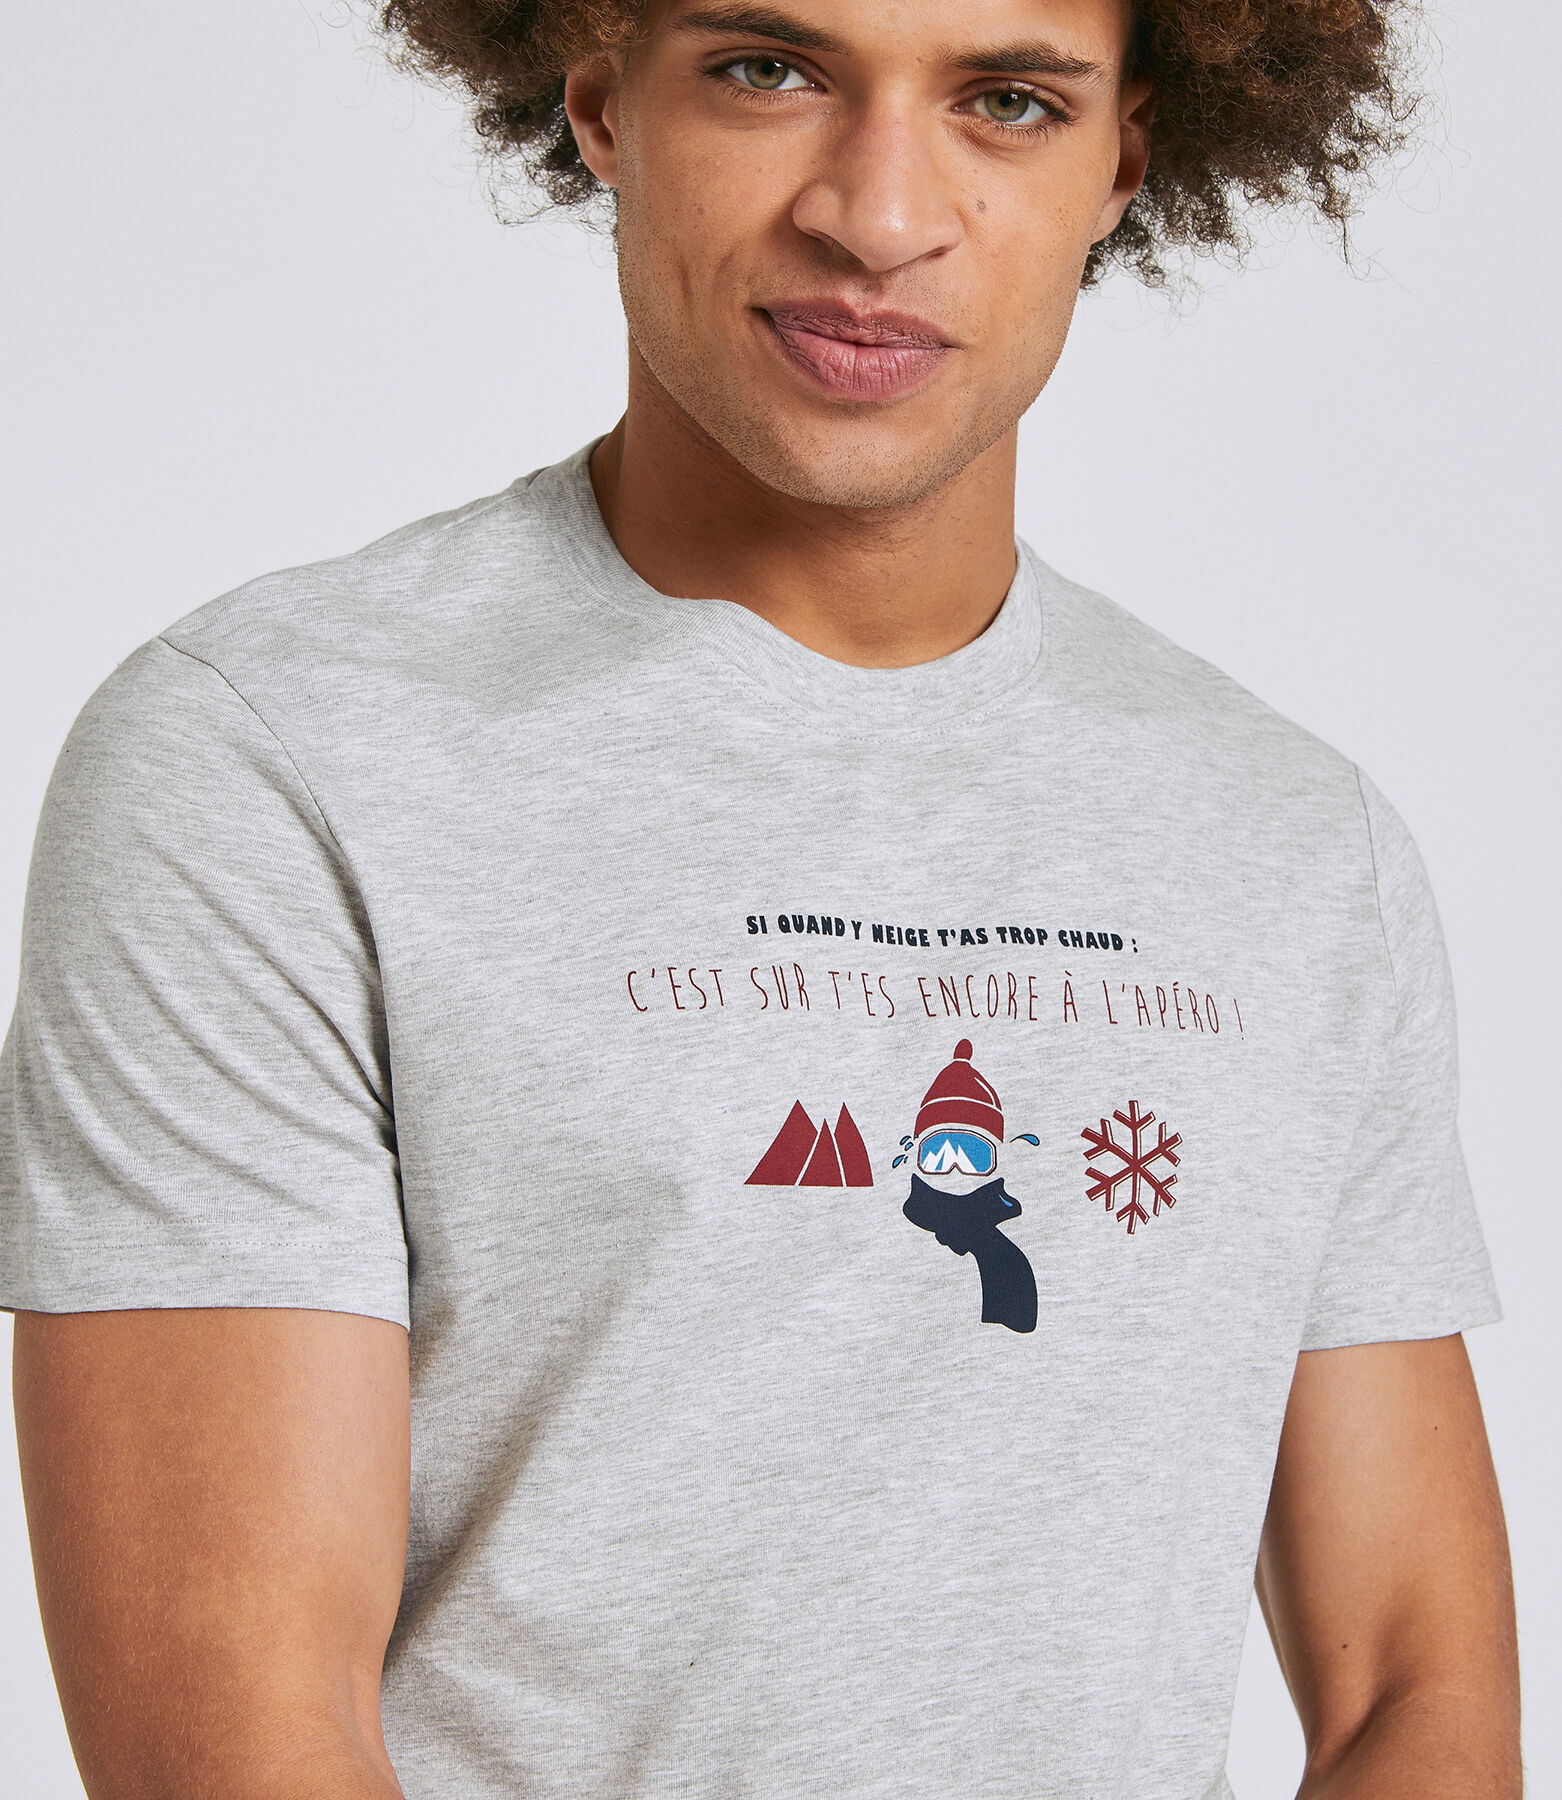 Tee shirt imprimé région Rhones-Alpes - Isère/Savo